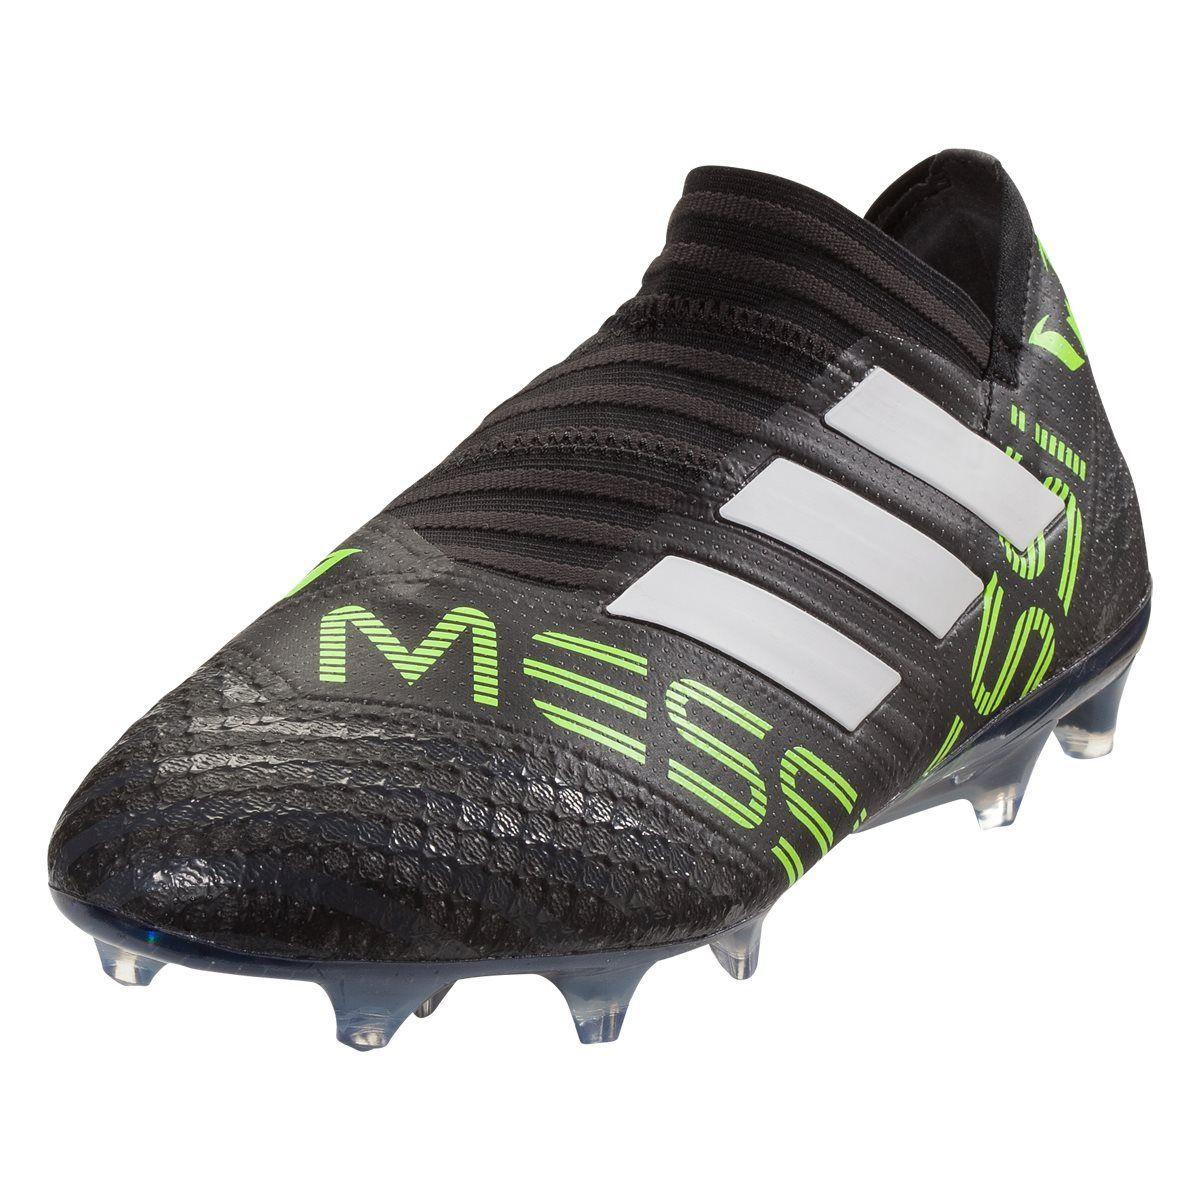 sale retailer 89759 b708a adidas Nemeziz Messi 17+ 360Agility FG Soccer Cleats